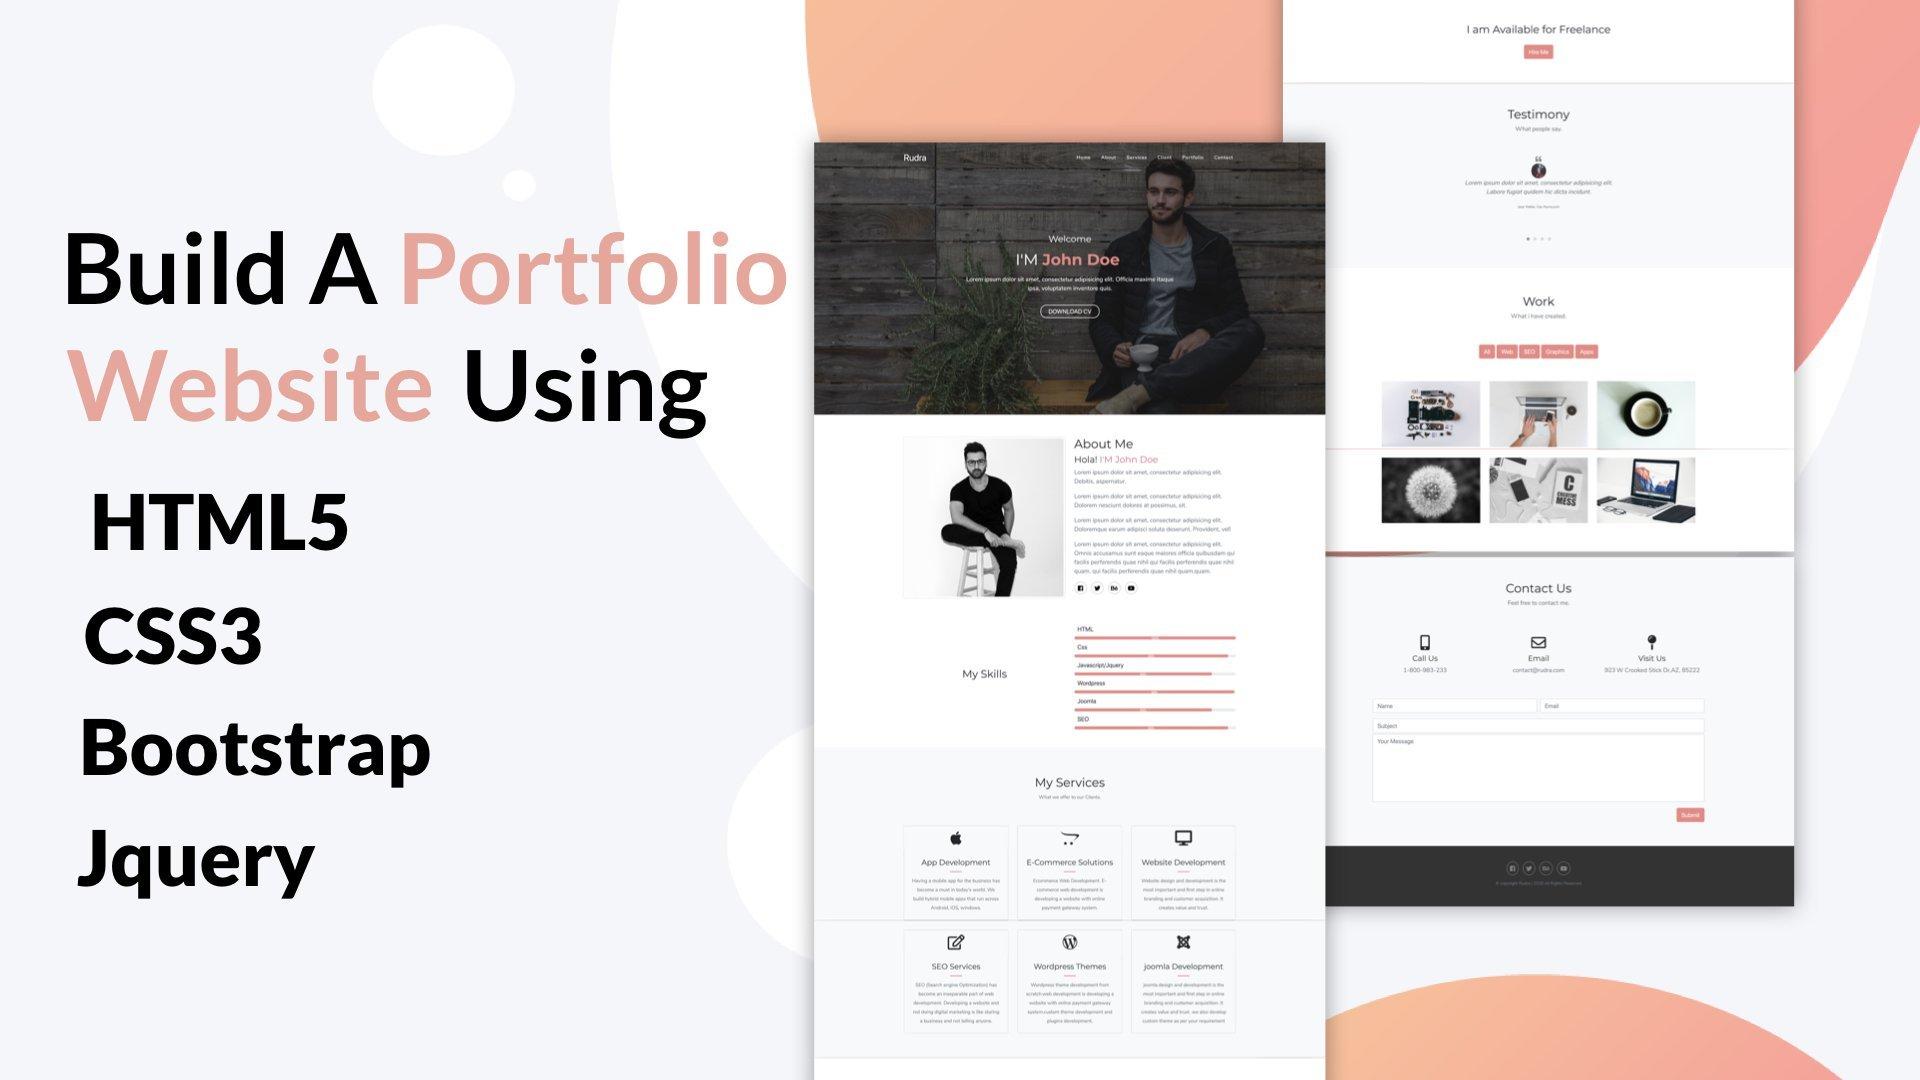 Build a Portfolio Website Using HTML5, CSS3, Bootstrap 4 and Jquery